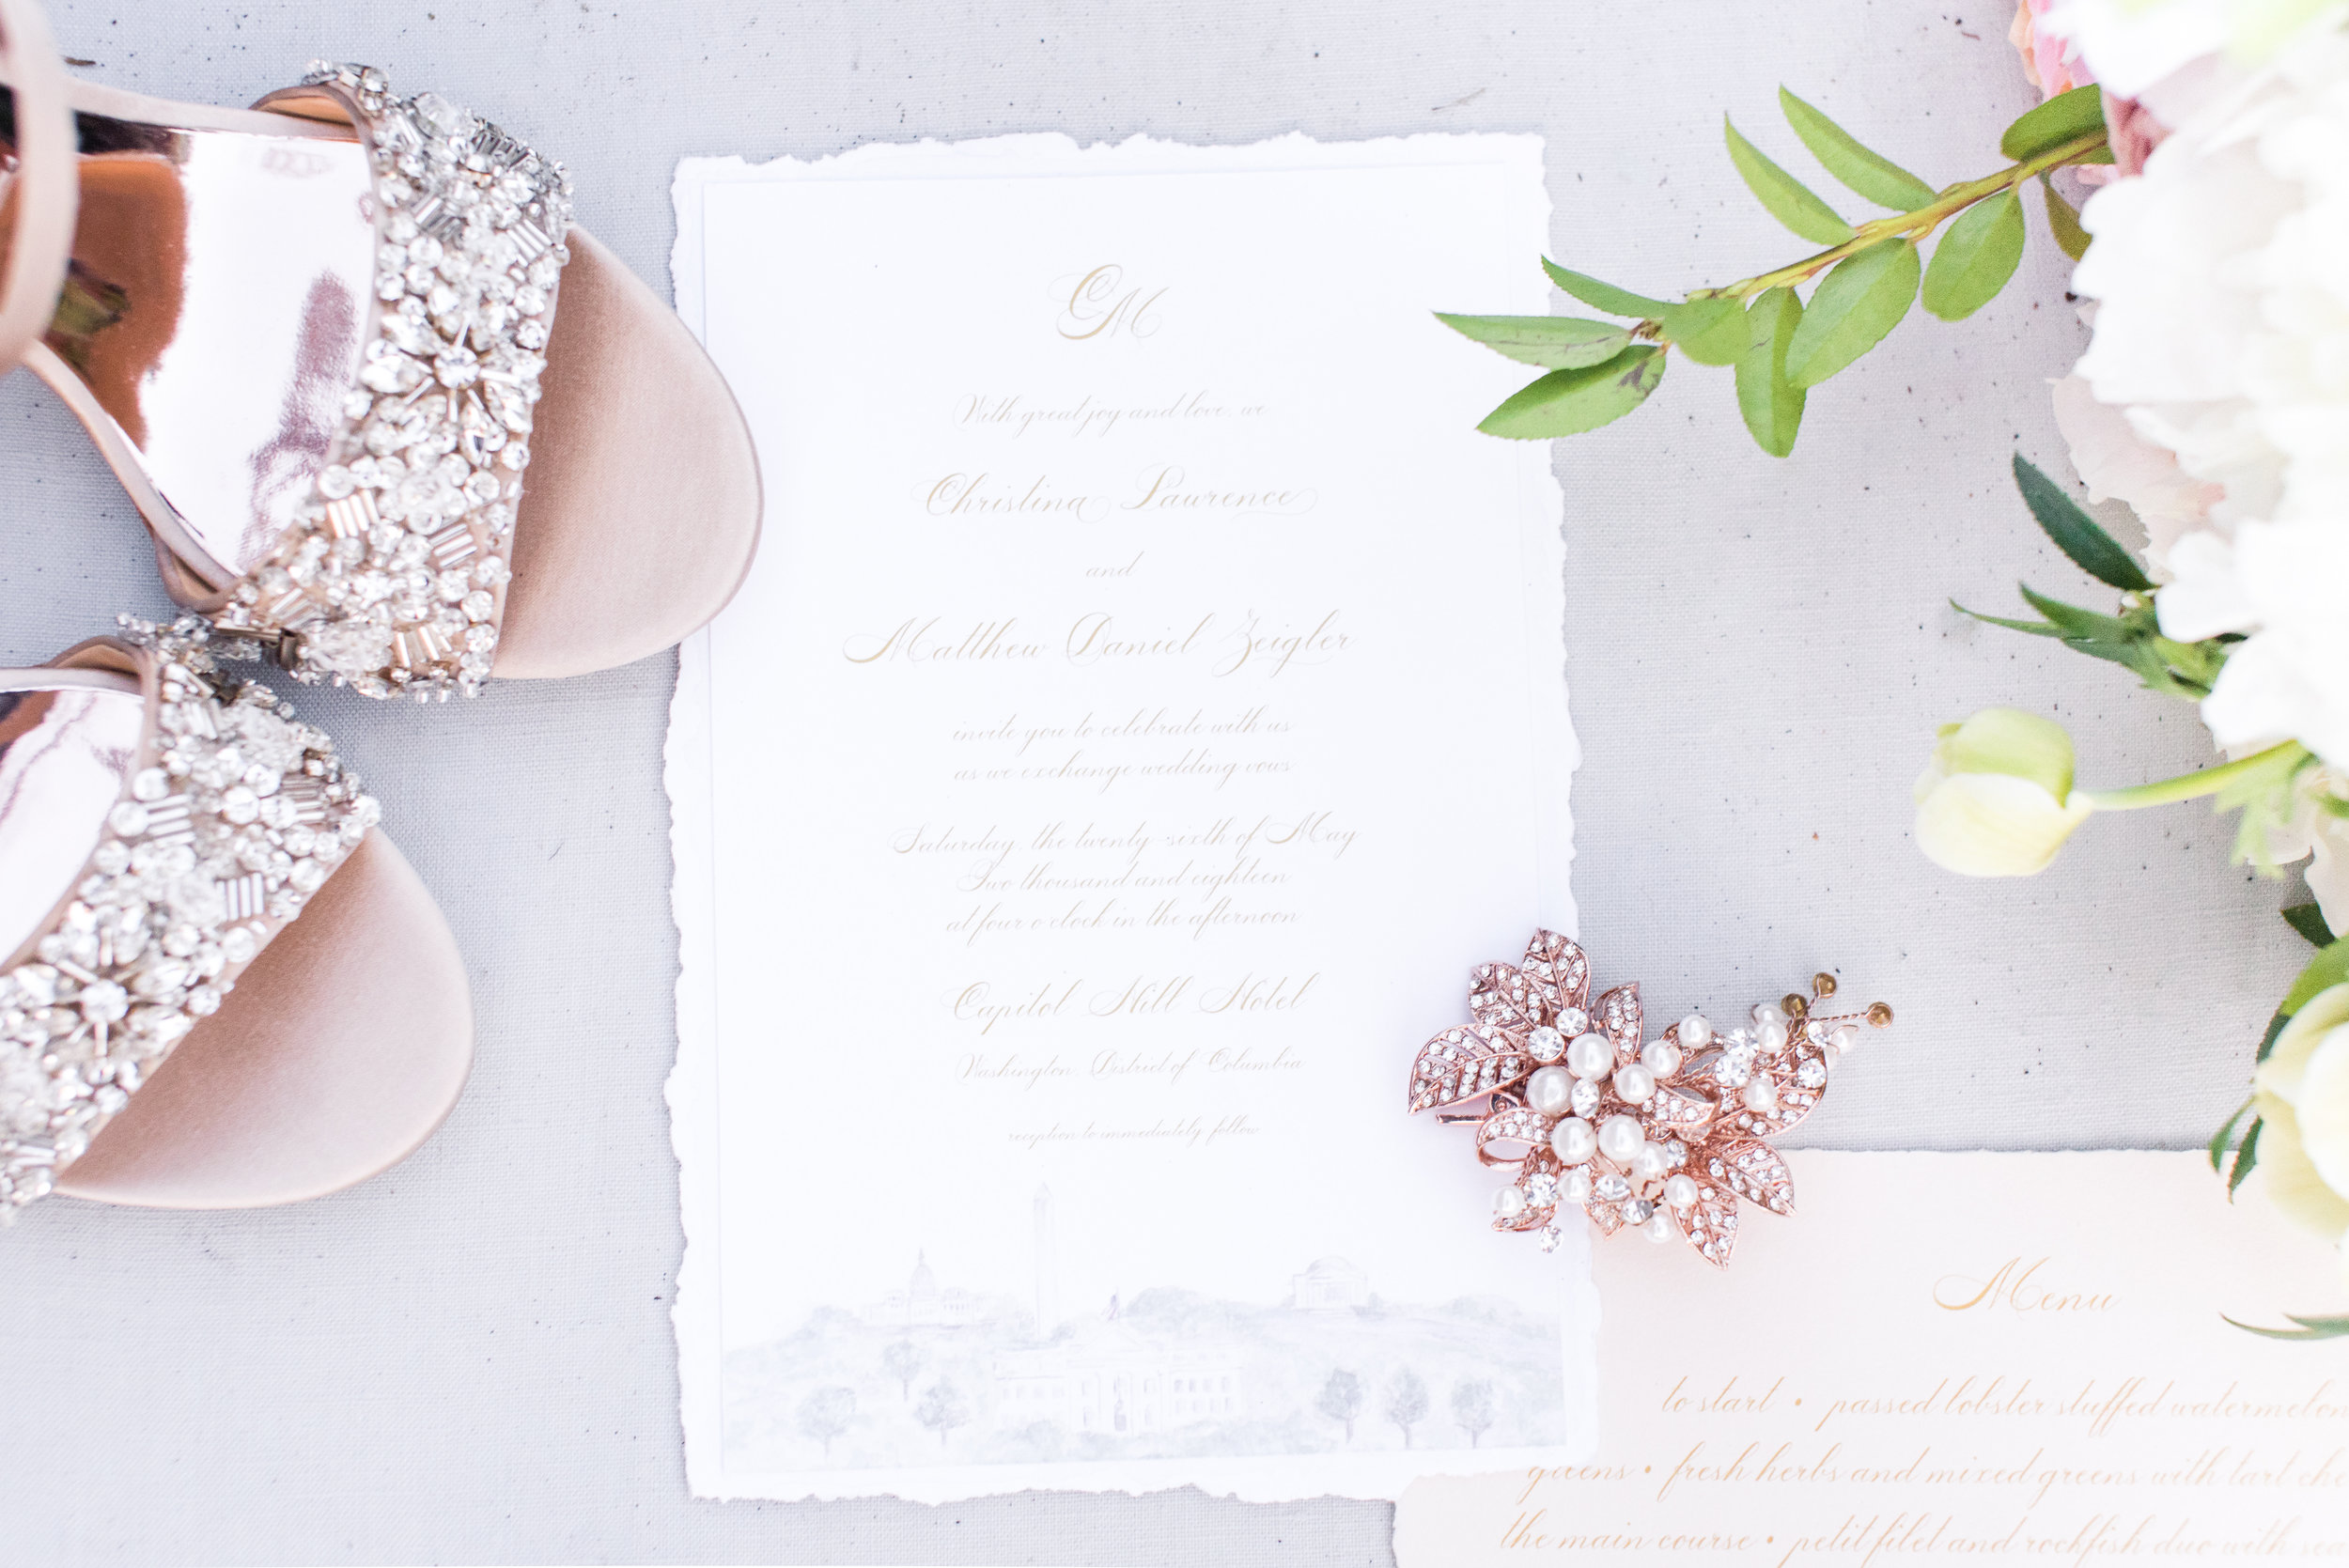 Washington-DC-Wedding-Invitations-Third-Clover-Manali-Sonntake-Photography.jpg